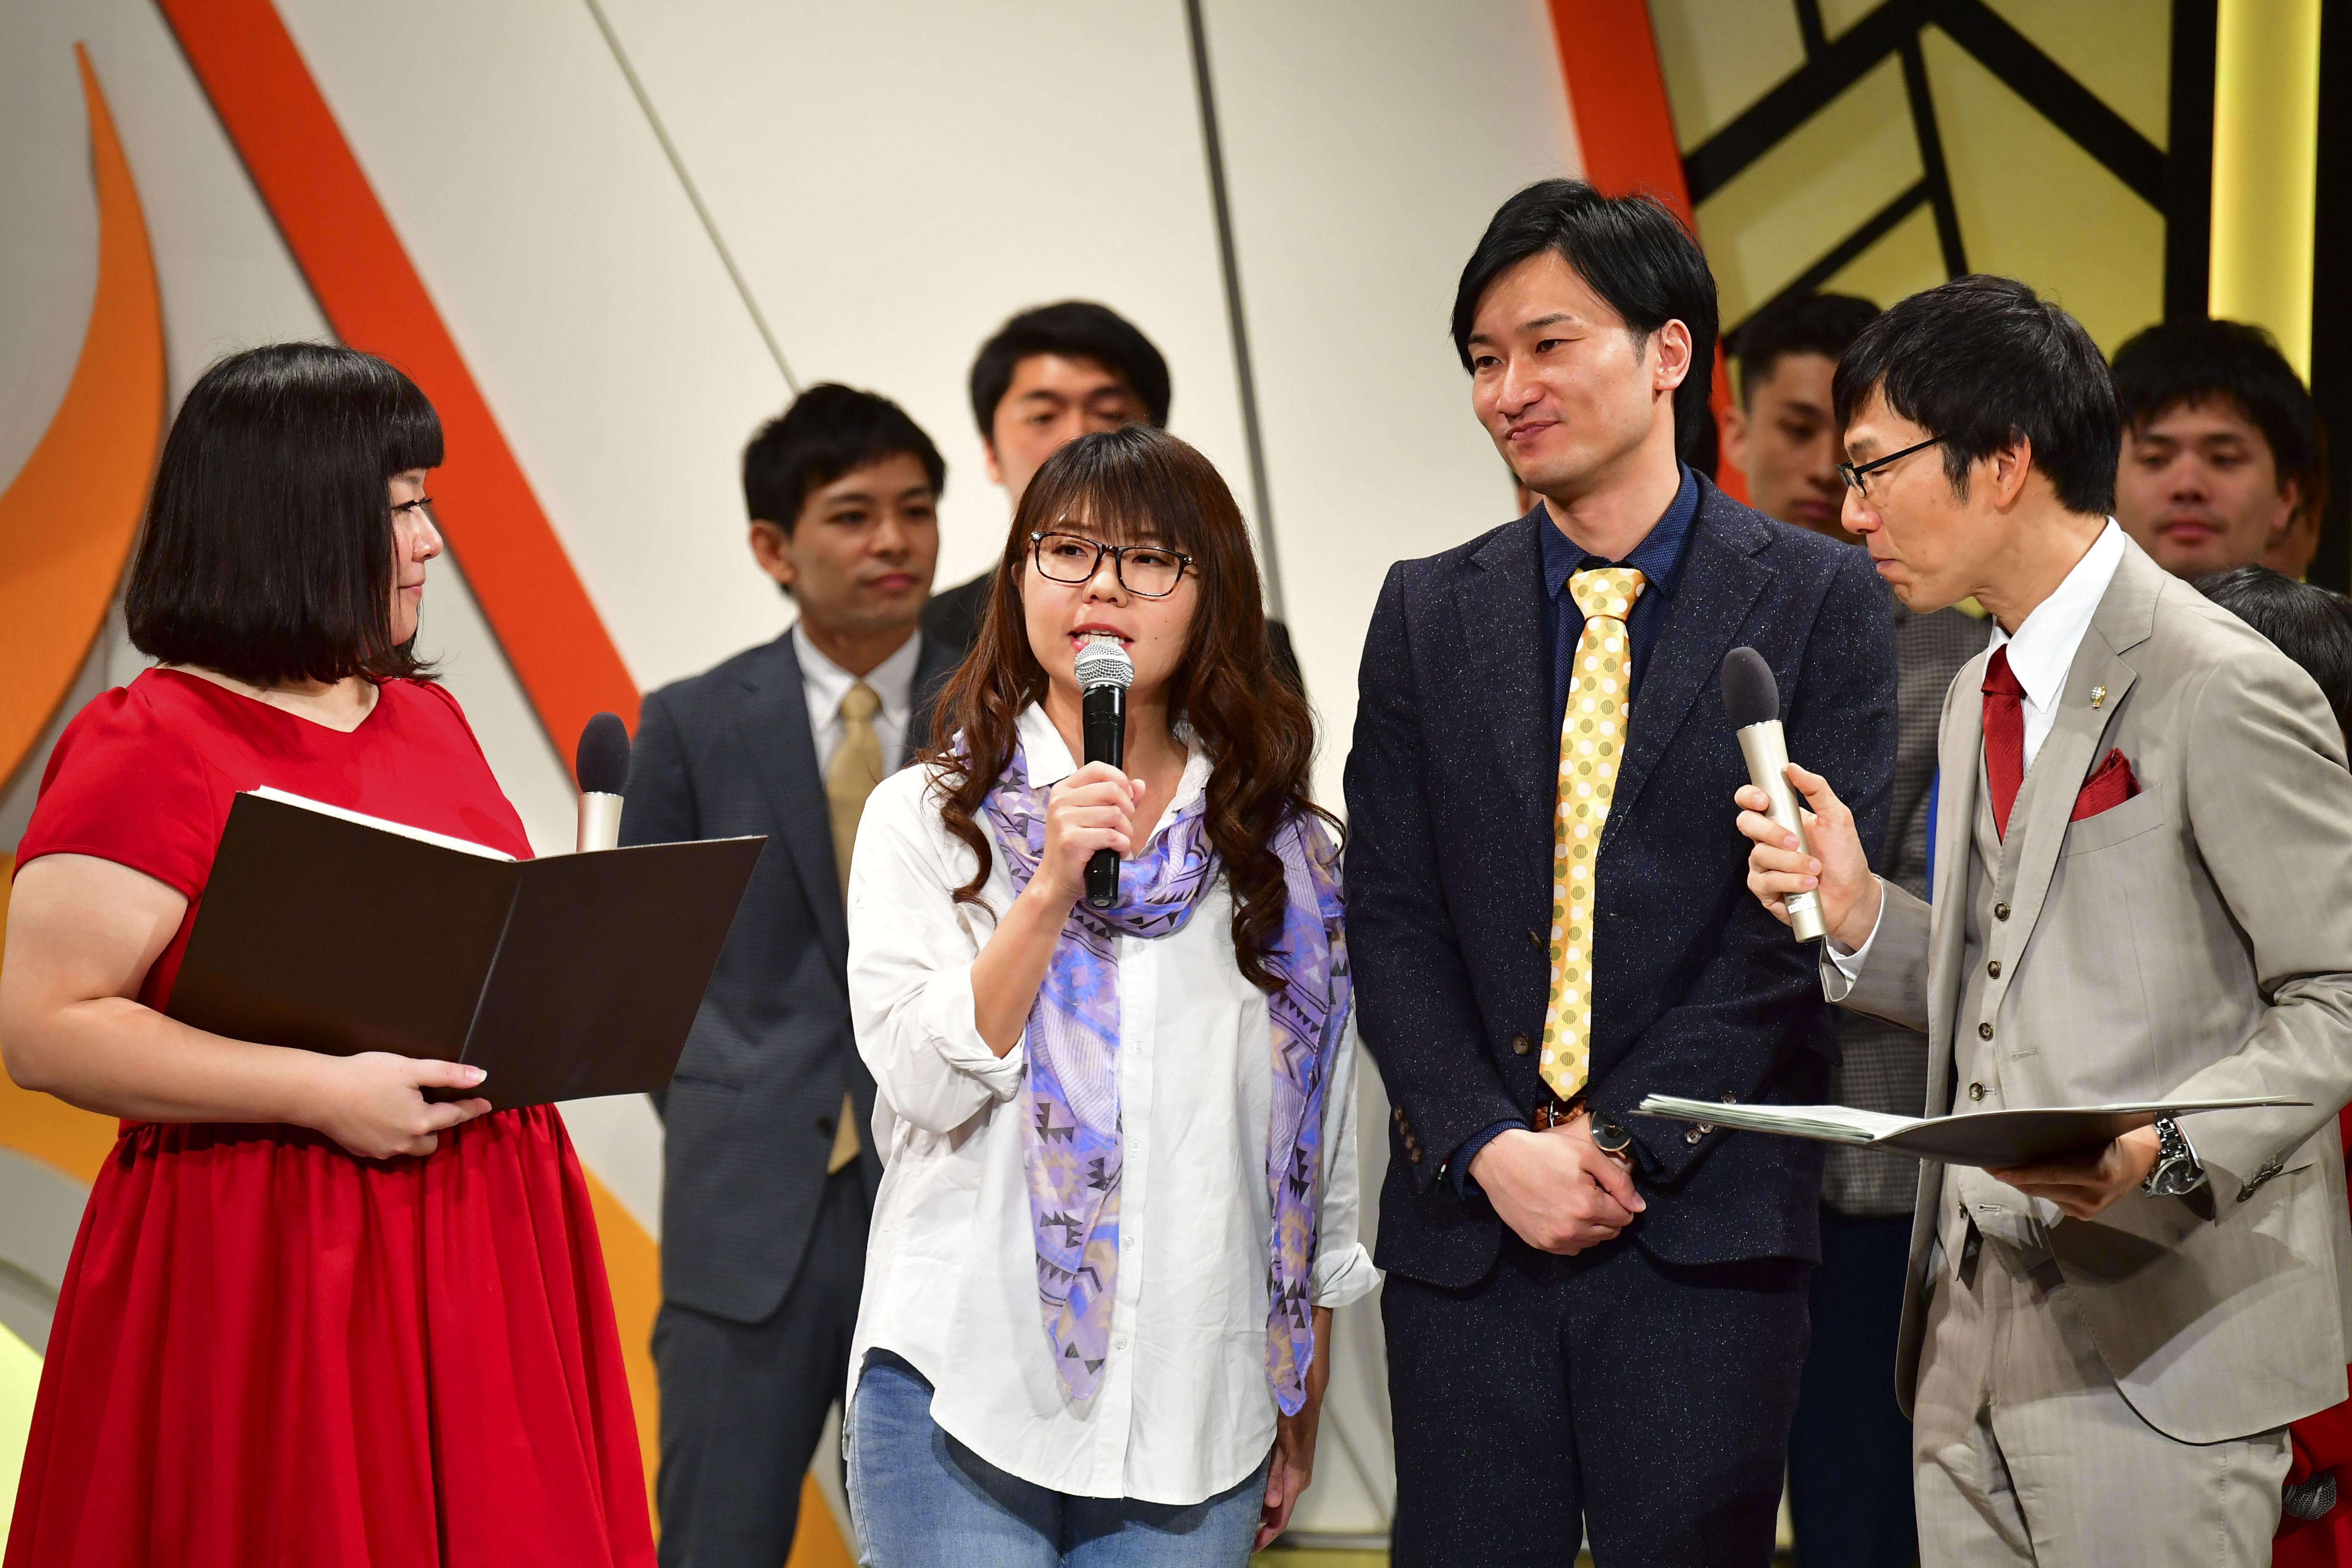 http://news.yoshimoto.co.jp/20171201191629-7efda0a5bddc2ebd696abc635bc1e0a79e1816e7.jpg